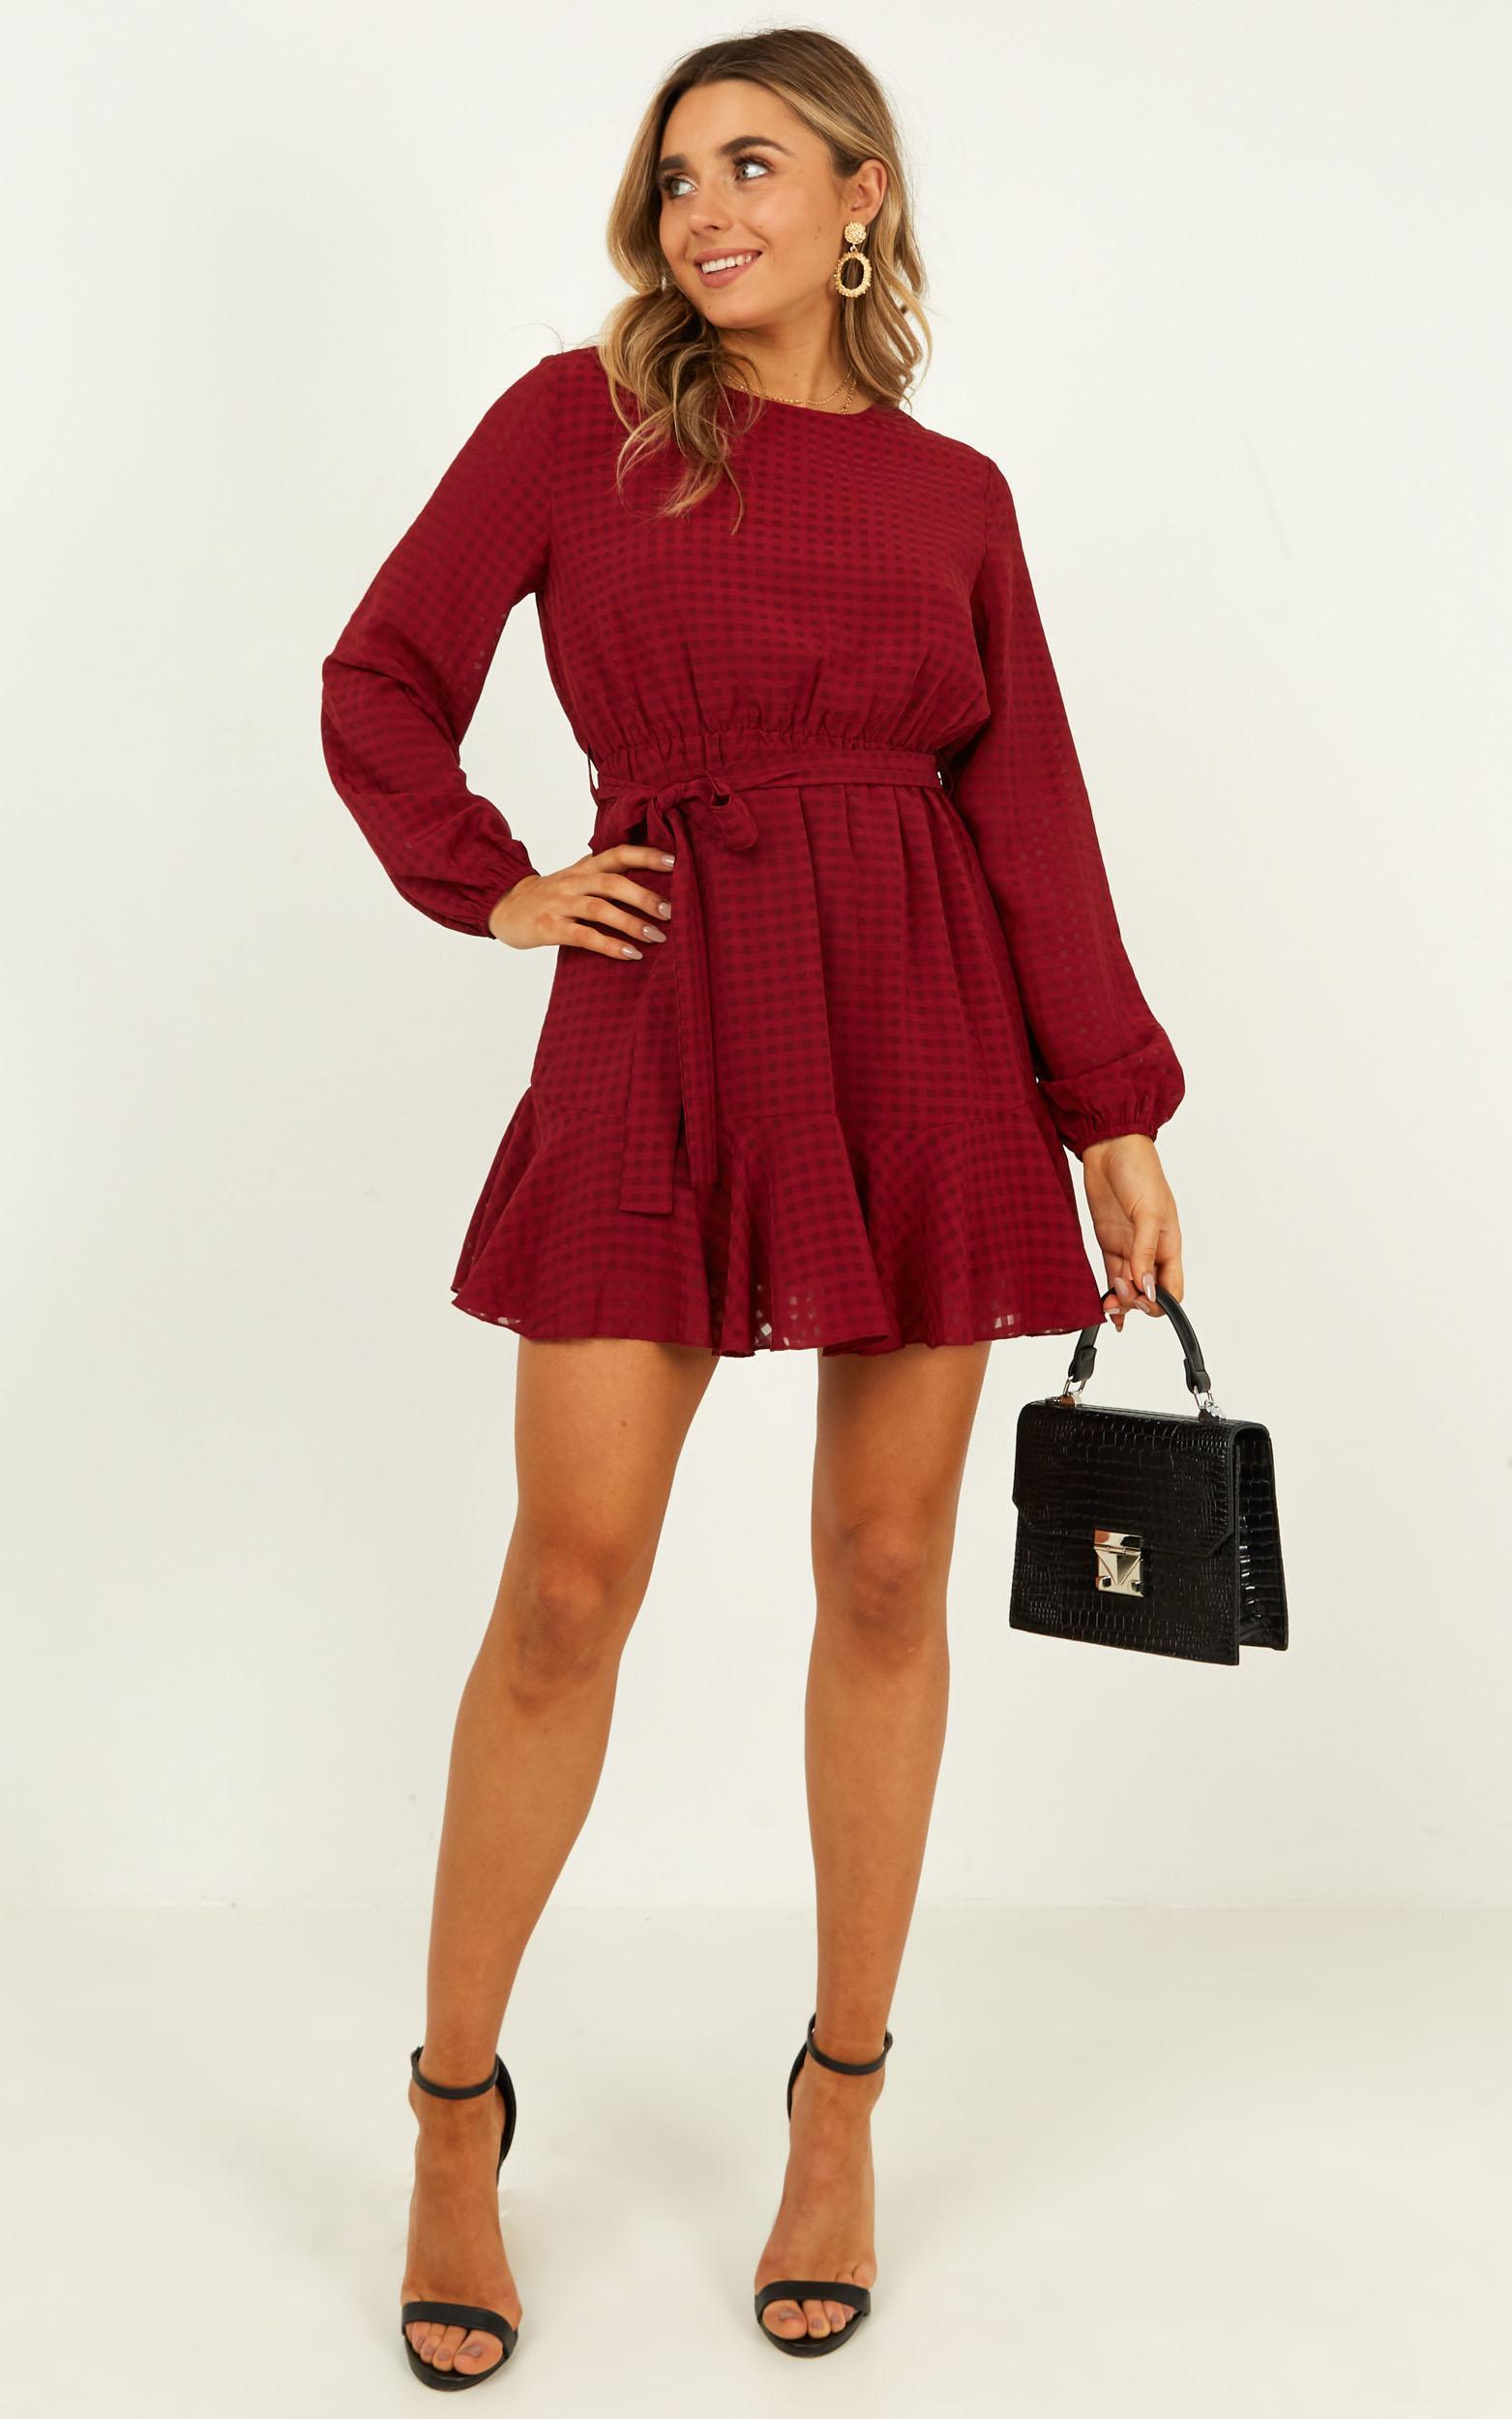 Streamline Dress in wine - 20 (XXXXL), Wine, hi-res image number null